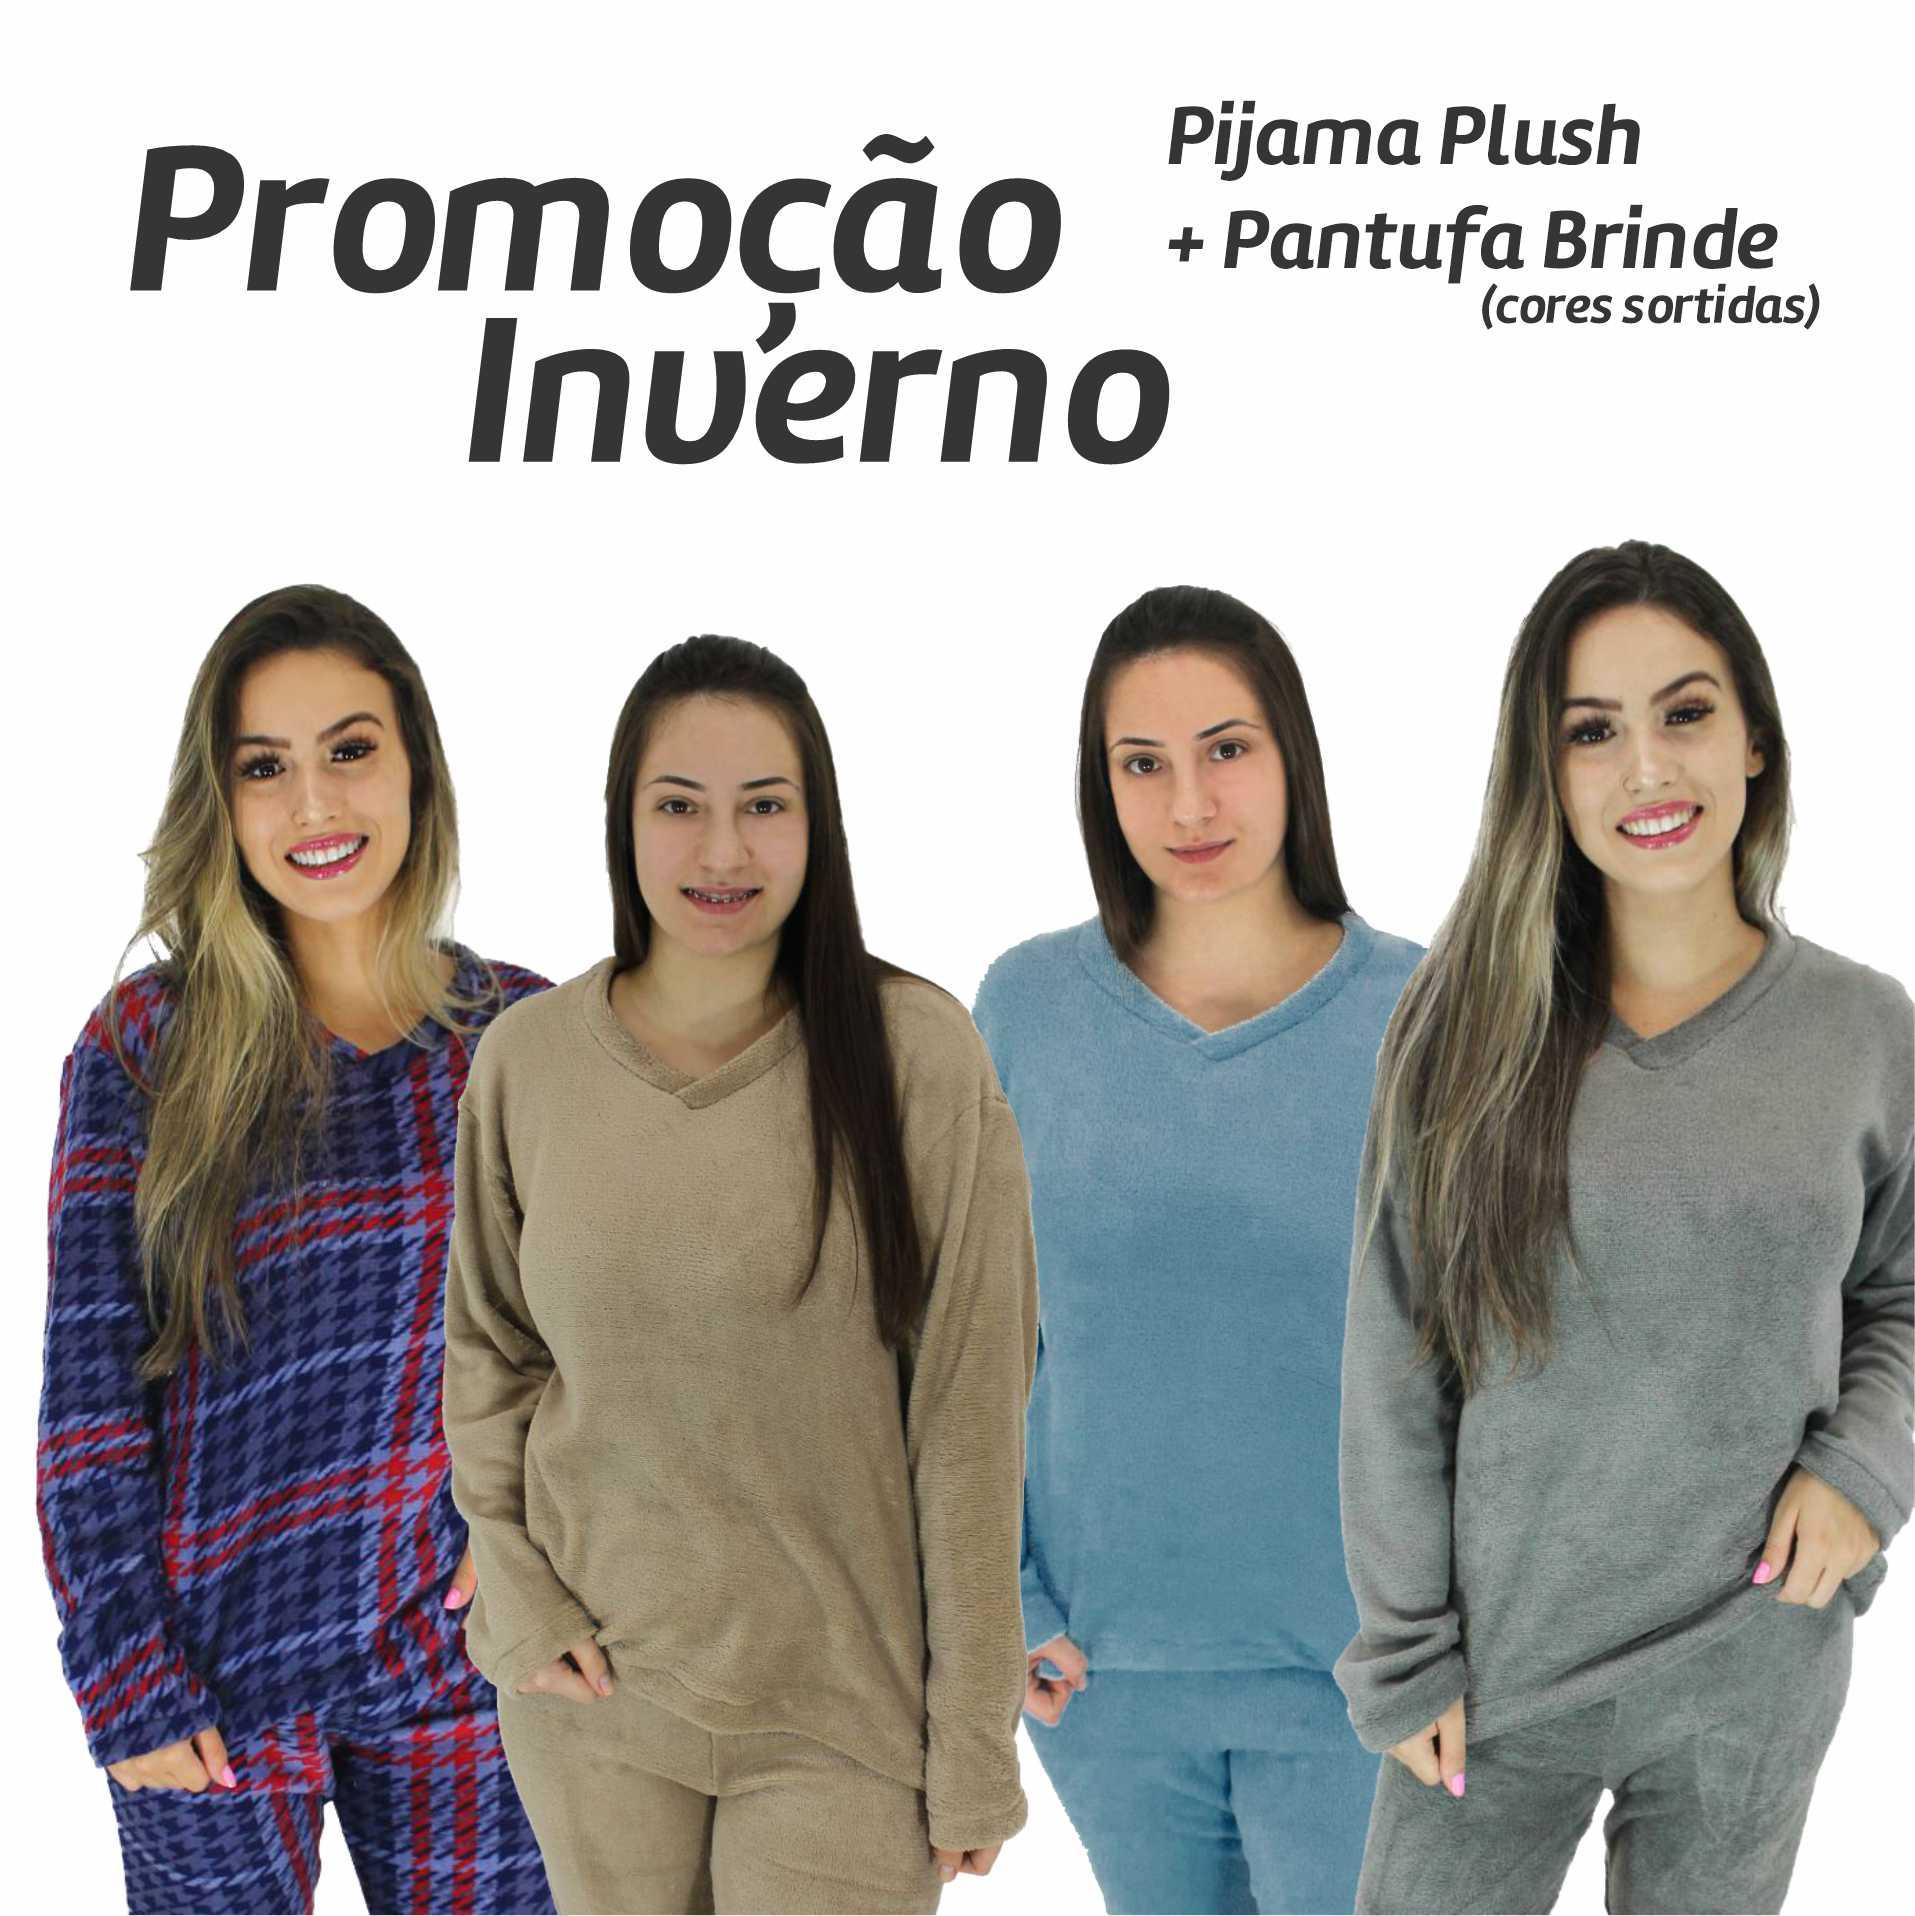 Pijama de Plush Manga Longa Feminino + Brinde Pantufa